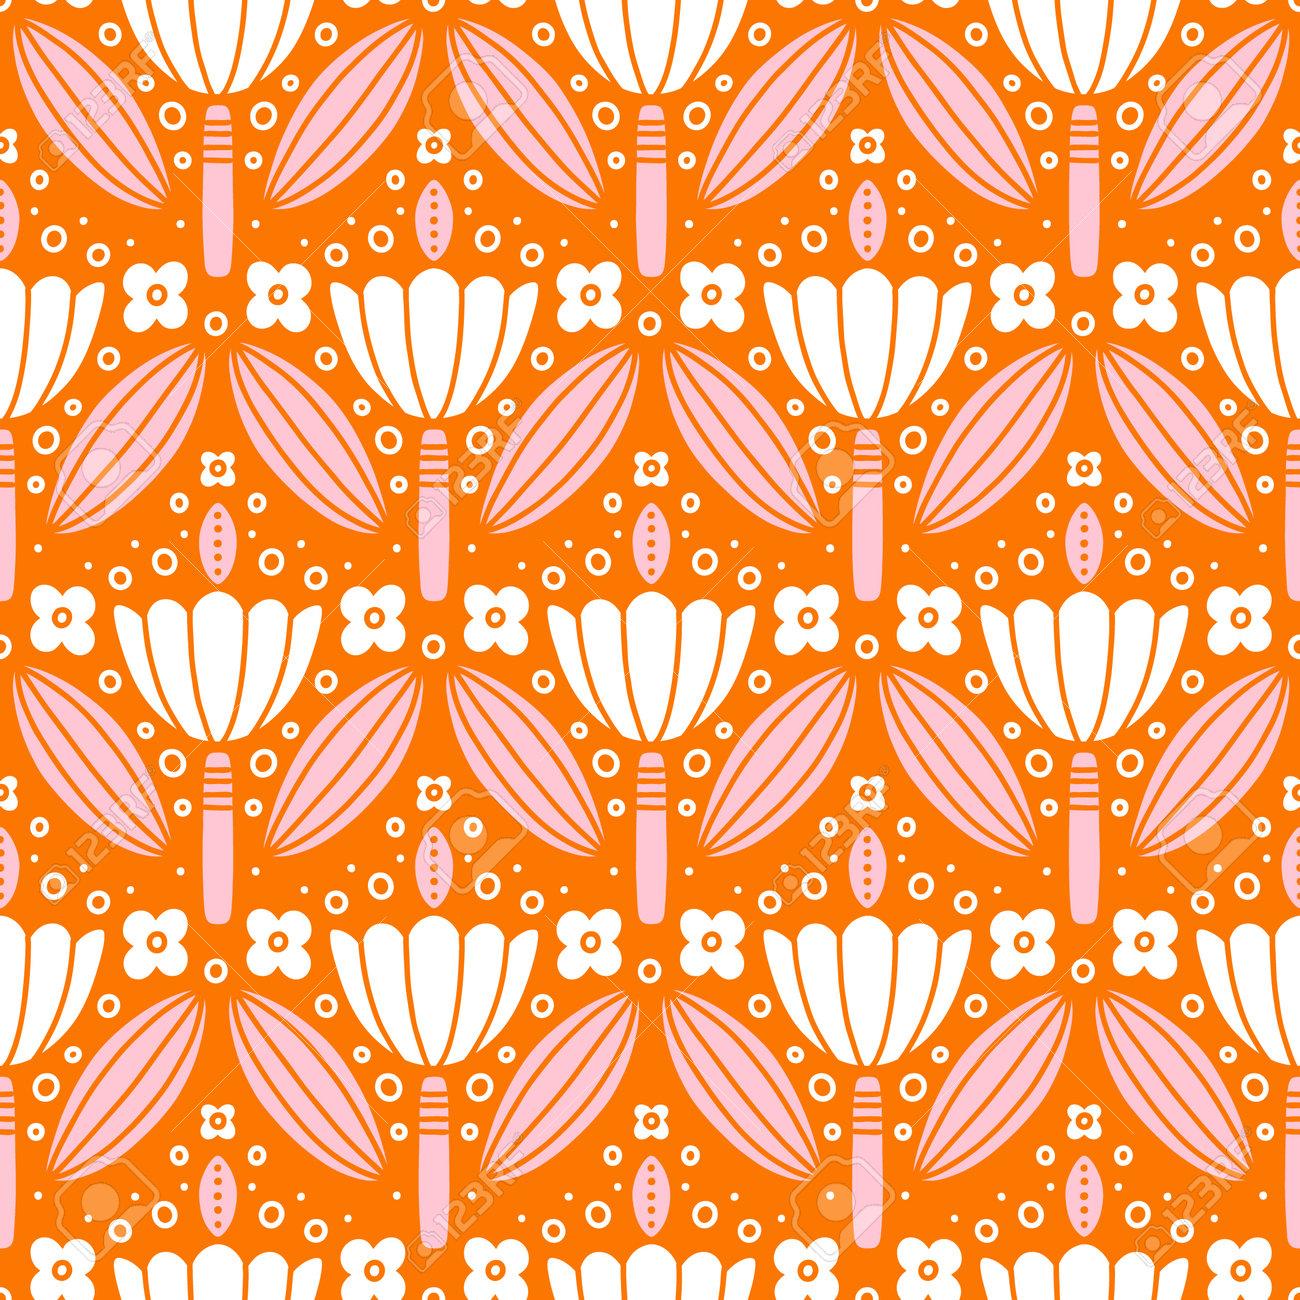 Pink and white flowers symmetric ornament, folk motives, vector seamless pattern - 162599335